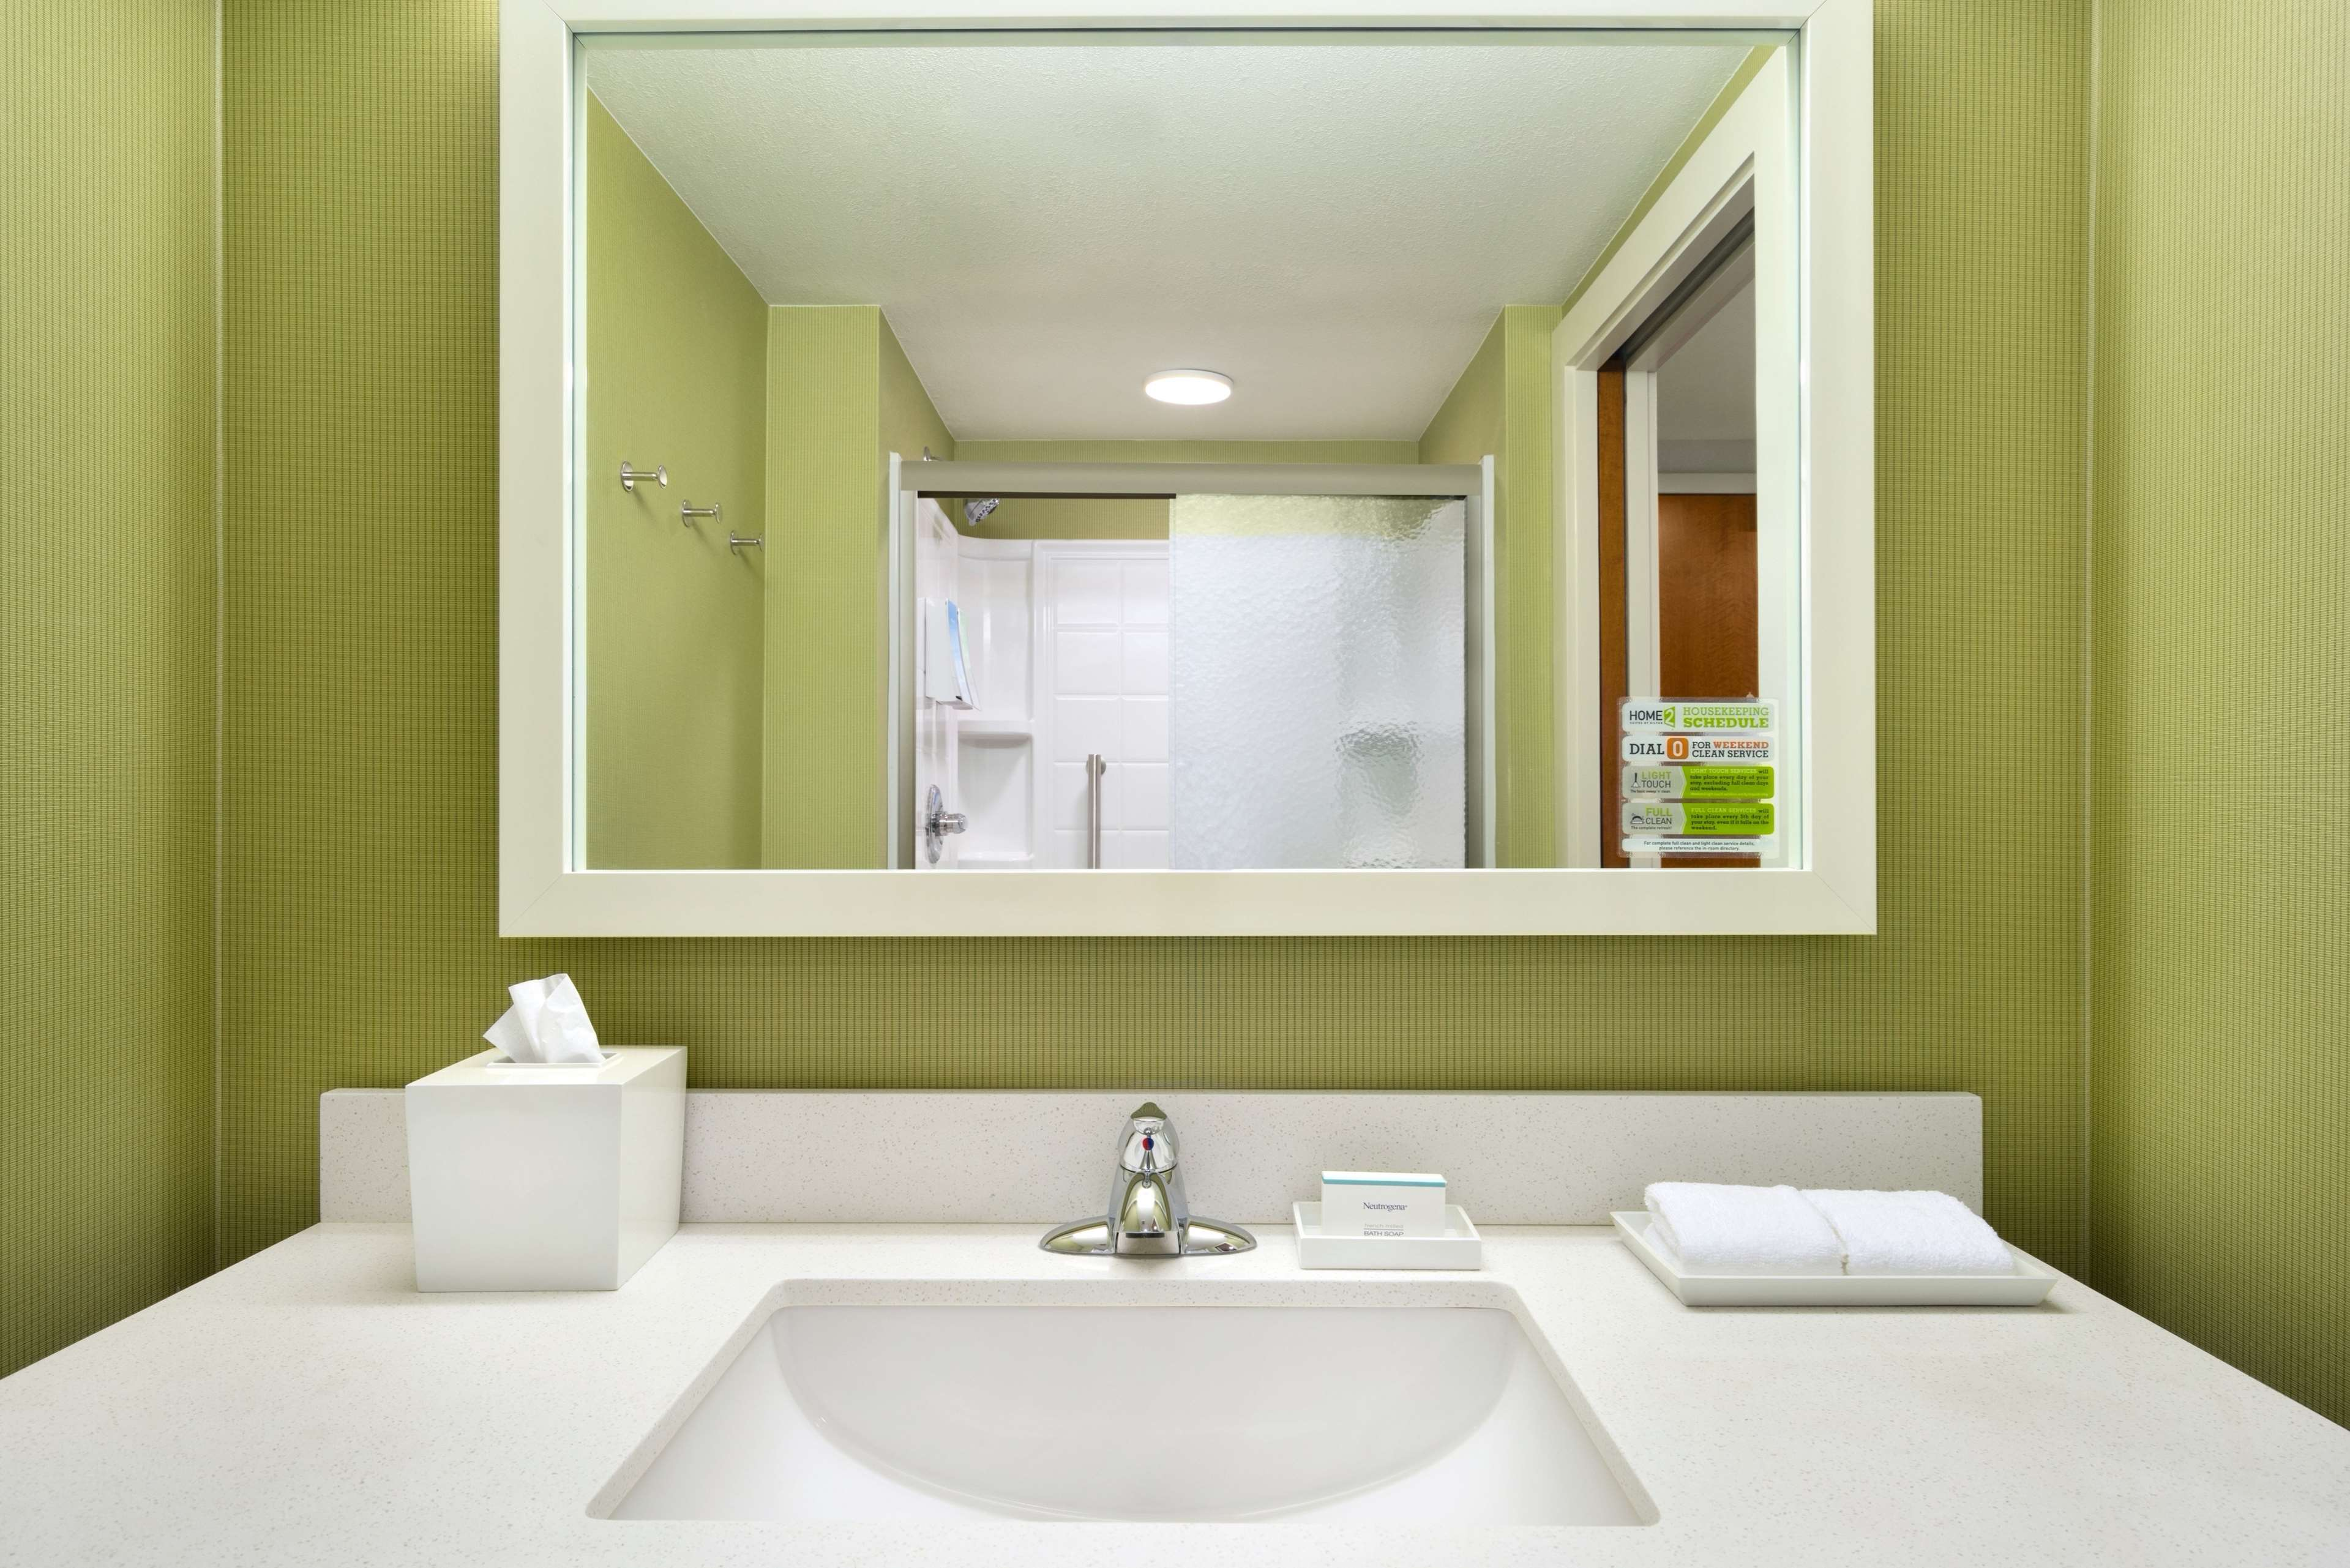 Home2 Suites by Hilton Leavenworth Downtown image 26